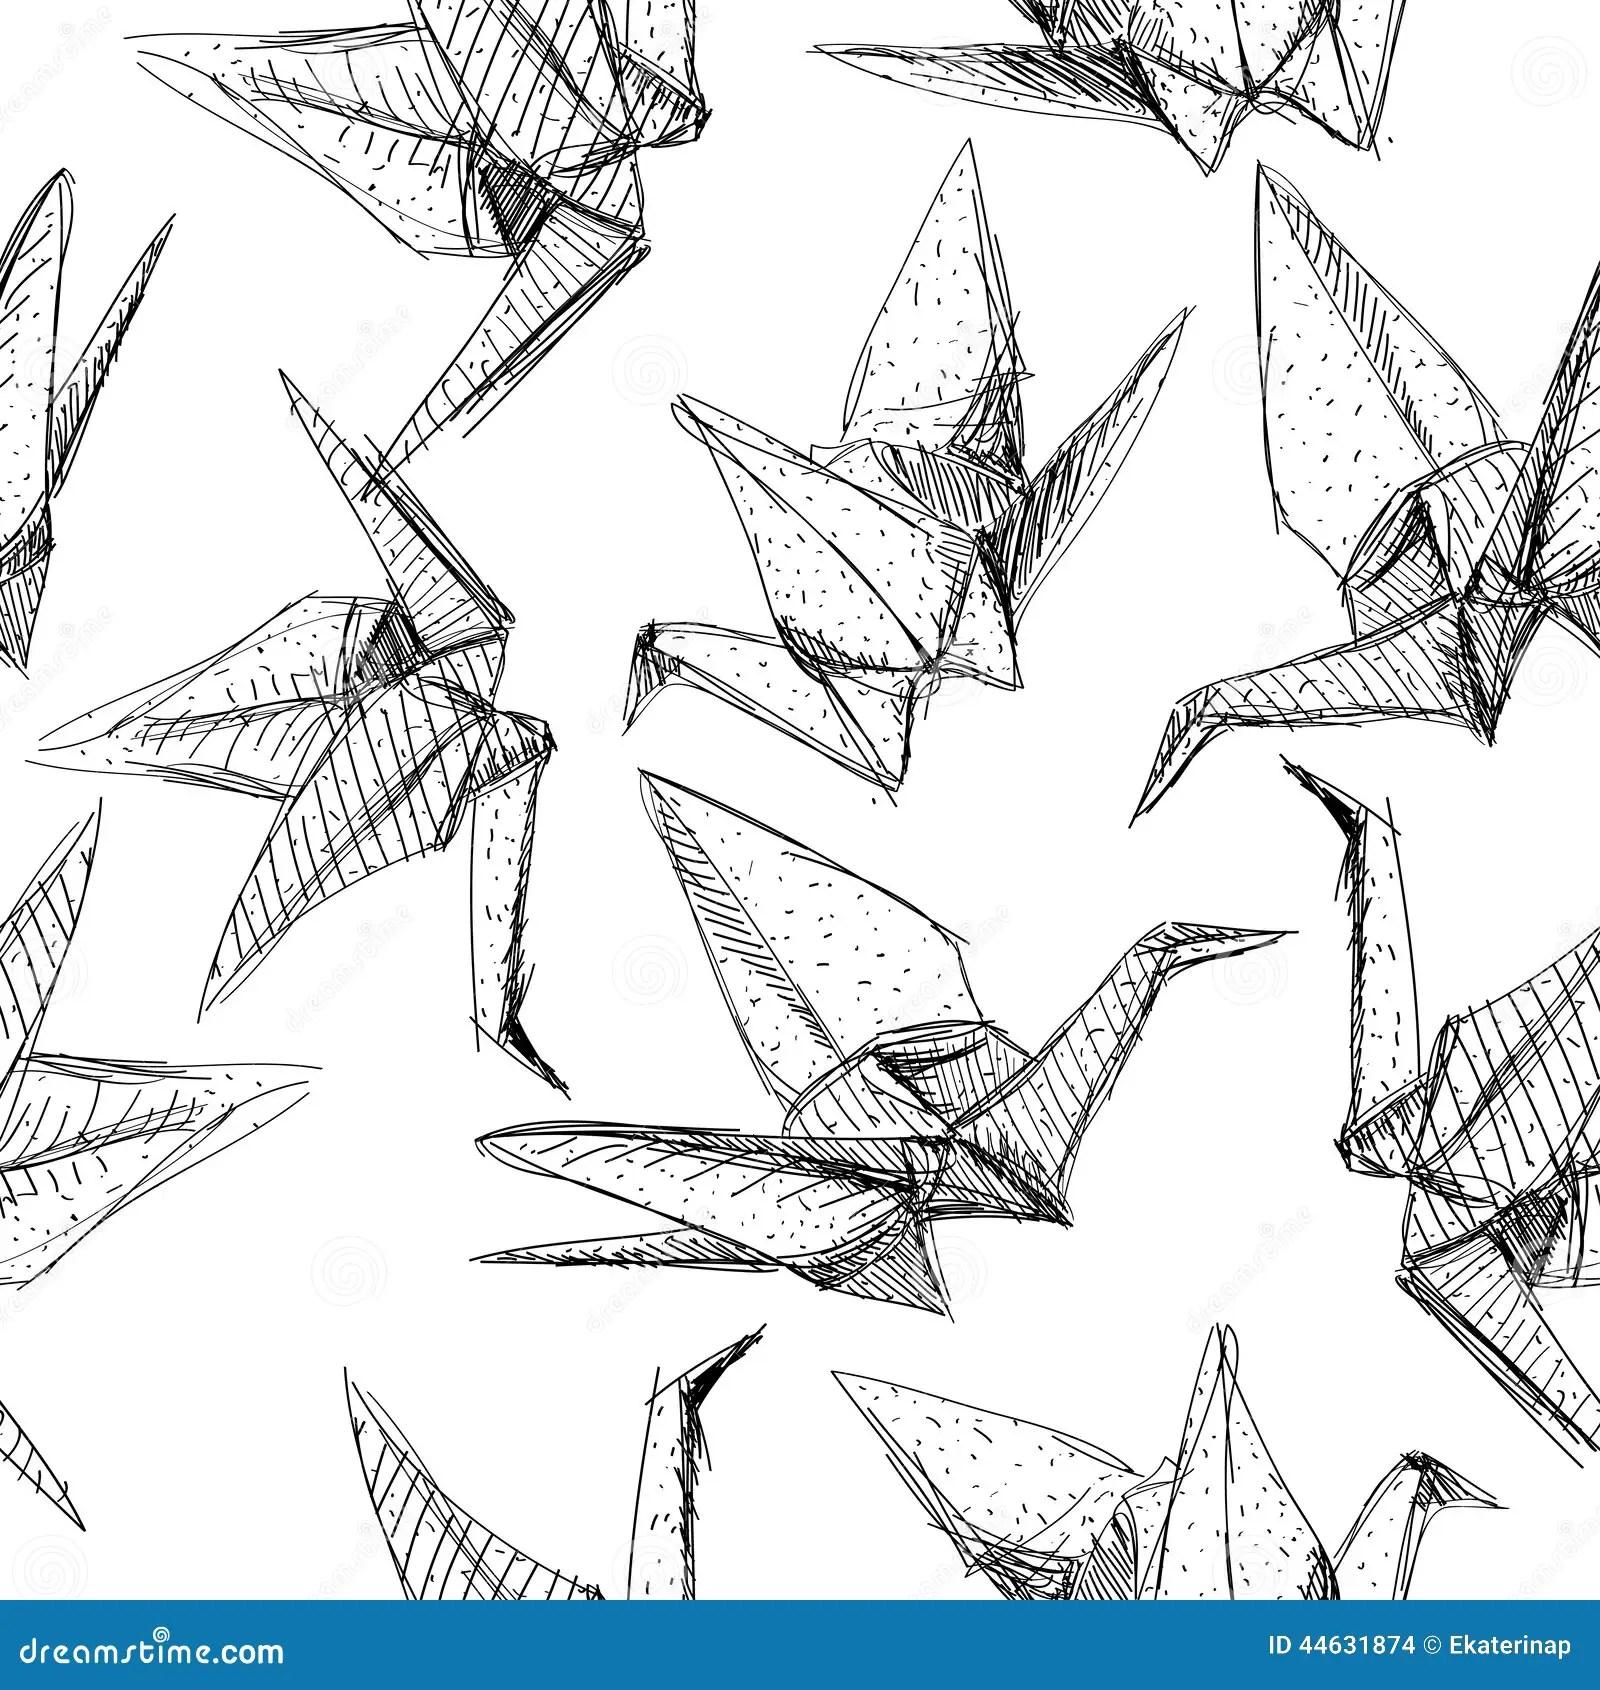 Origami Paper Cranes Set Sketch Seamless Pattern Black